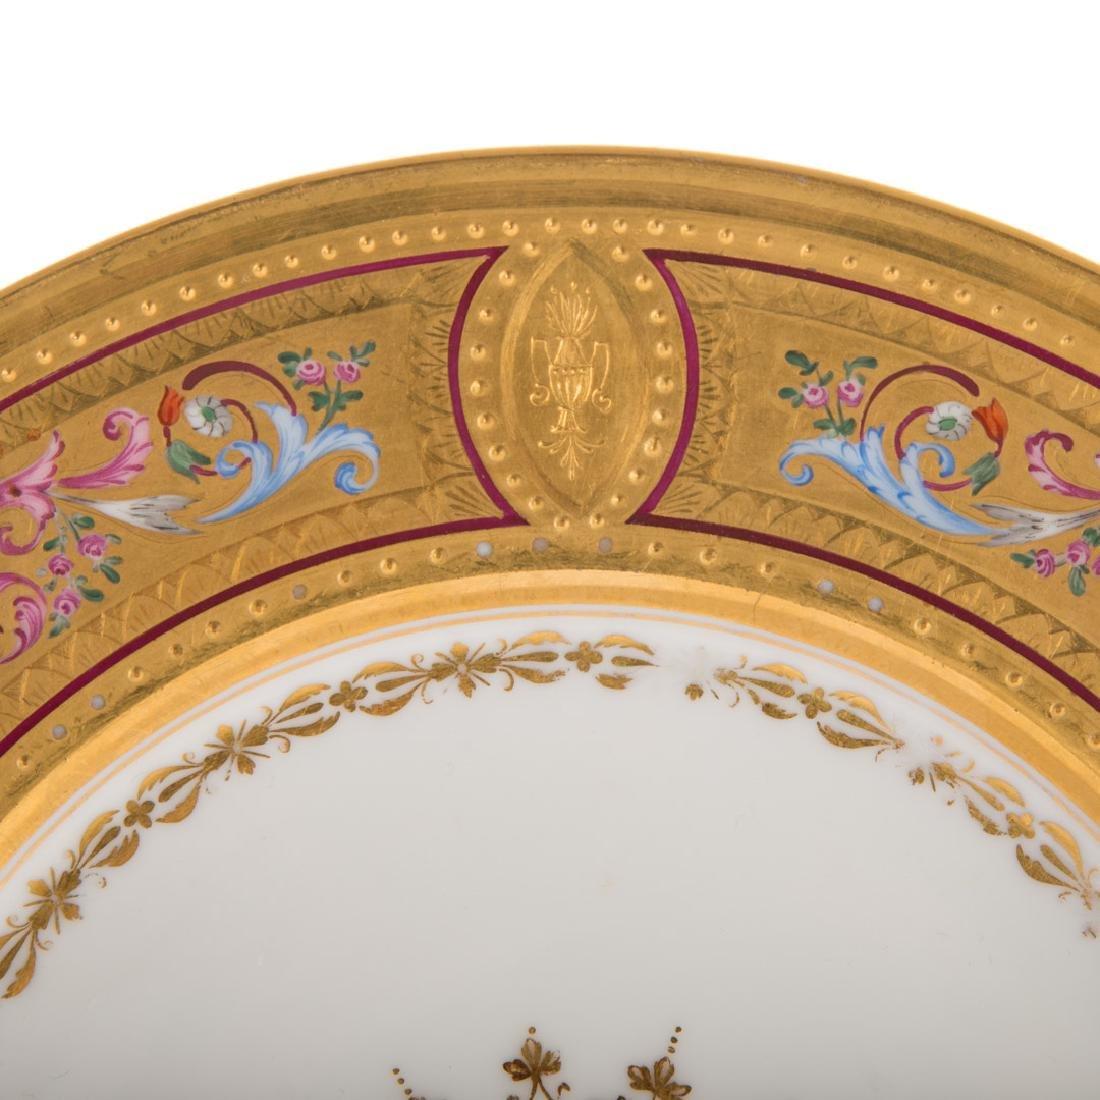 12 Vienna porcelain gilt & enamel decorated plates - 3